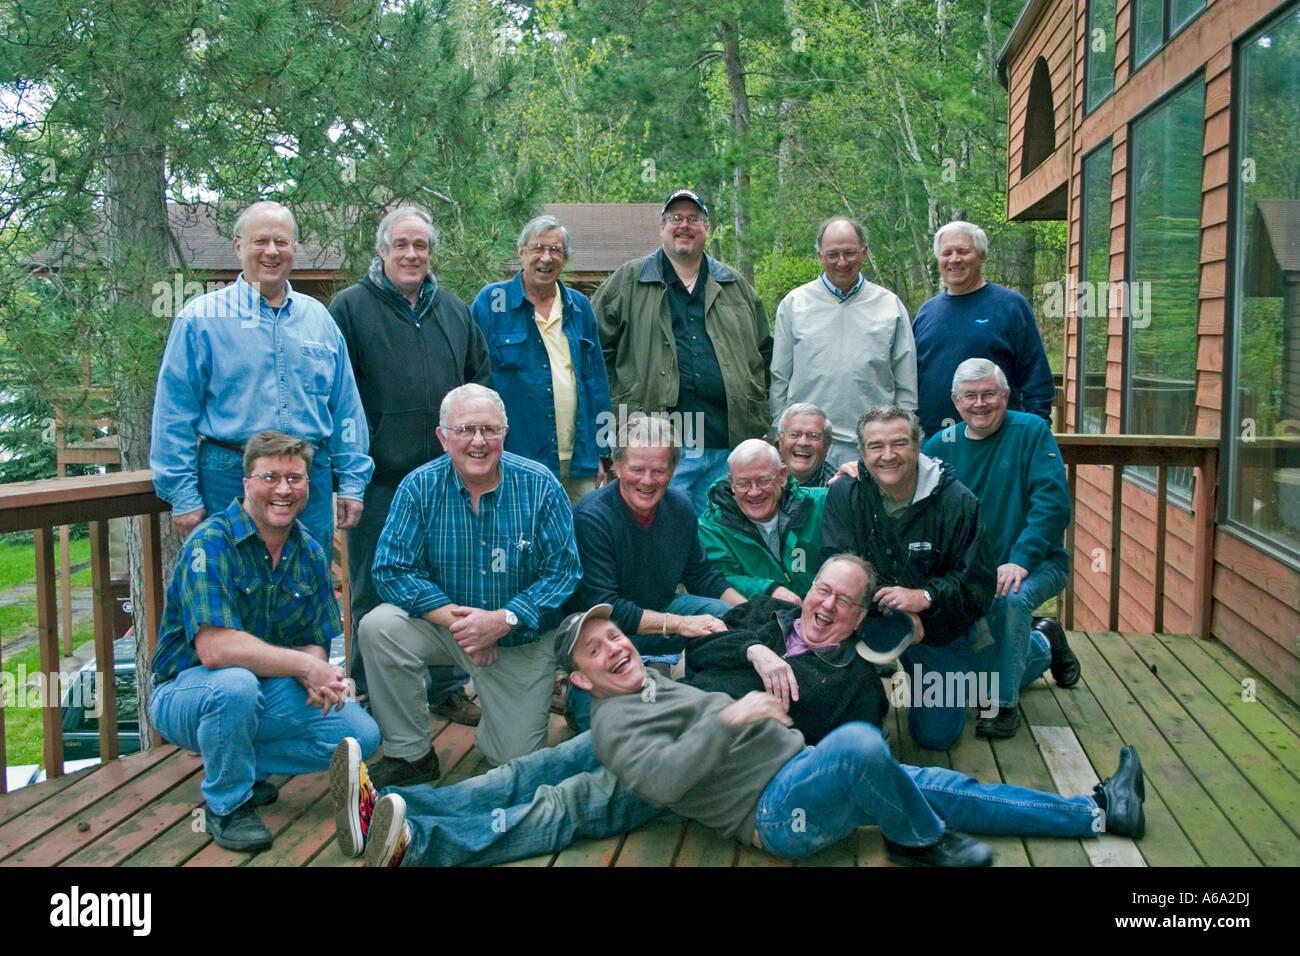 Photographer in black shirt trying to put a smile on a bunch of seasoned fishermen. Nisswa Minnesota USA - Stock Image